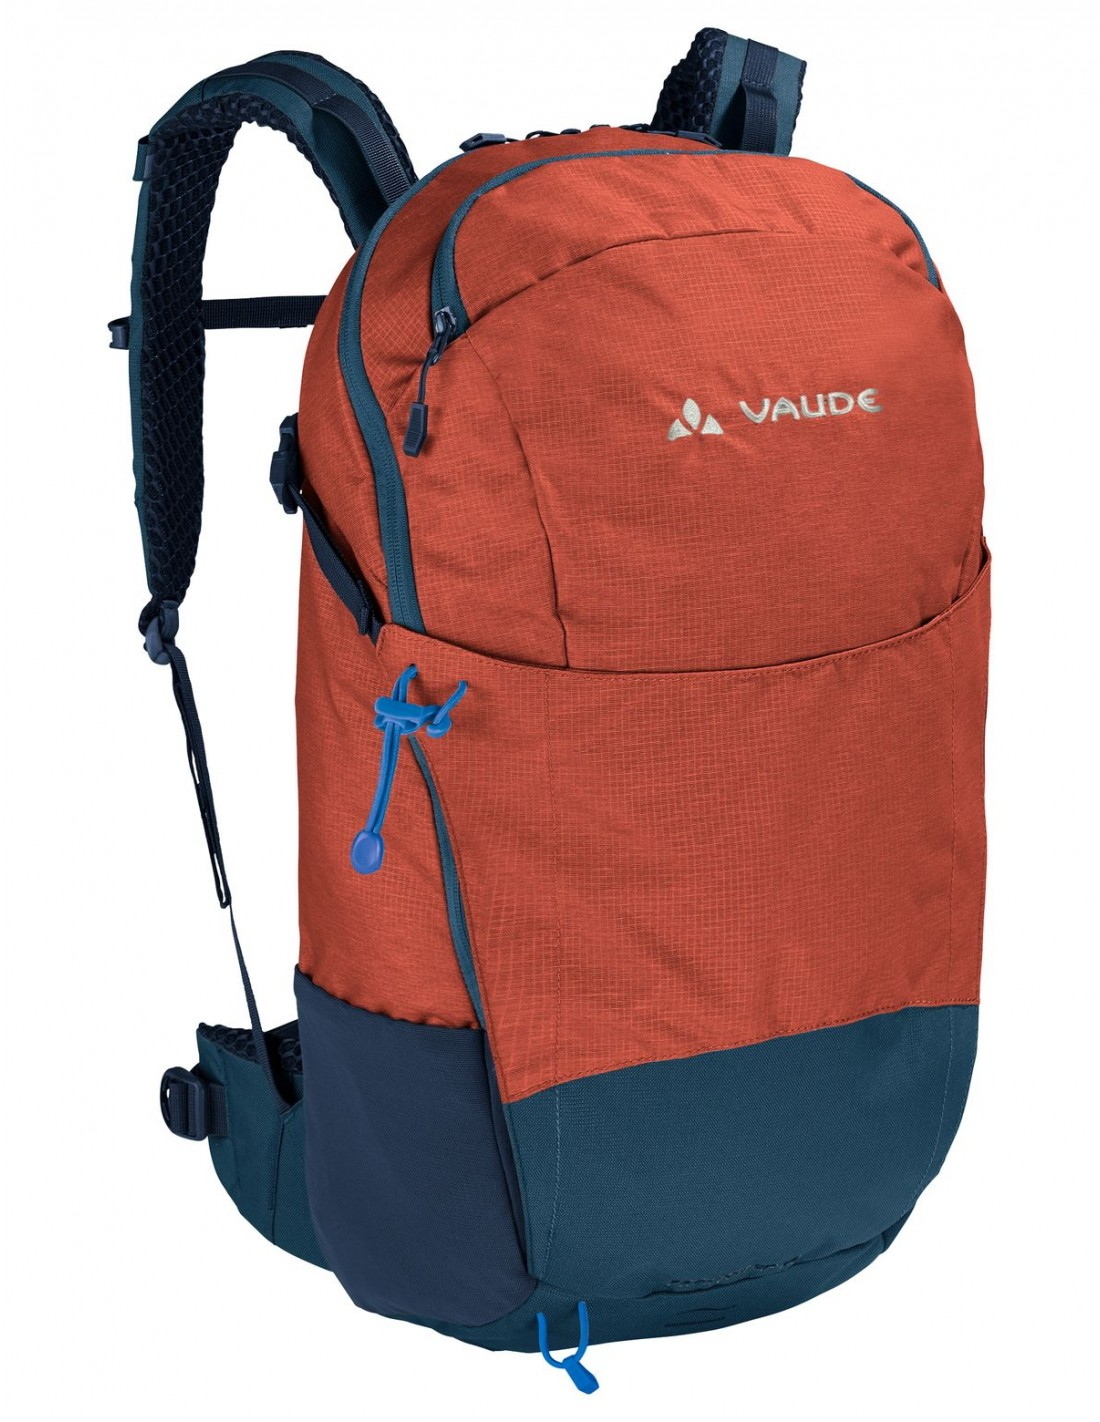 Vaude Rucksack Prokyon Zip 20, squirrel Rucksackart - Wandern & Trekking, R günstig online kaufen